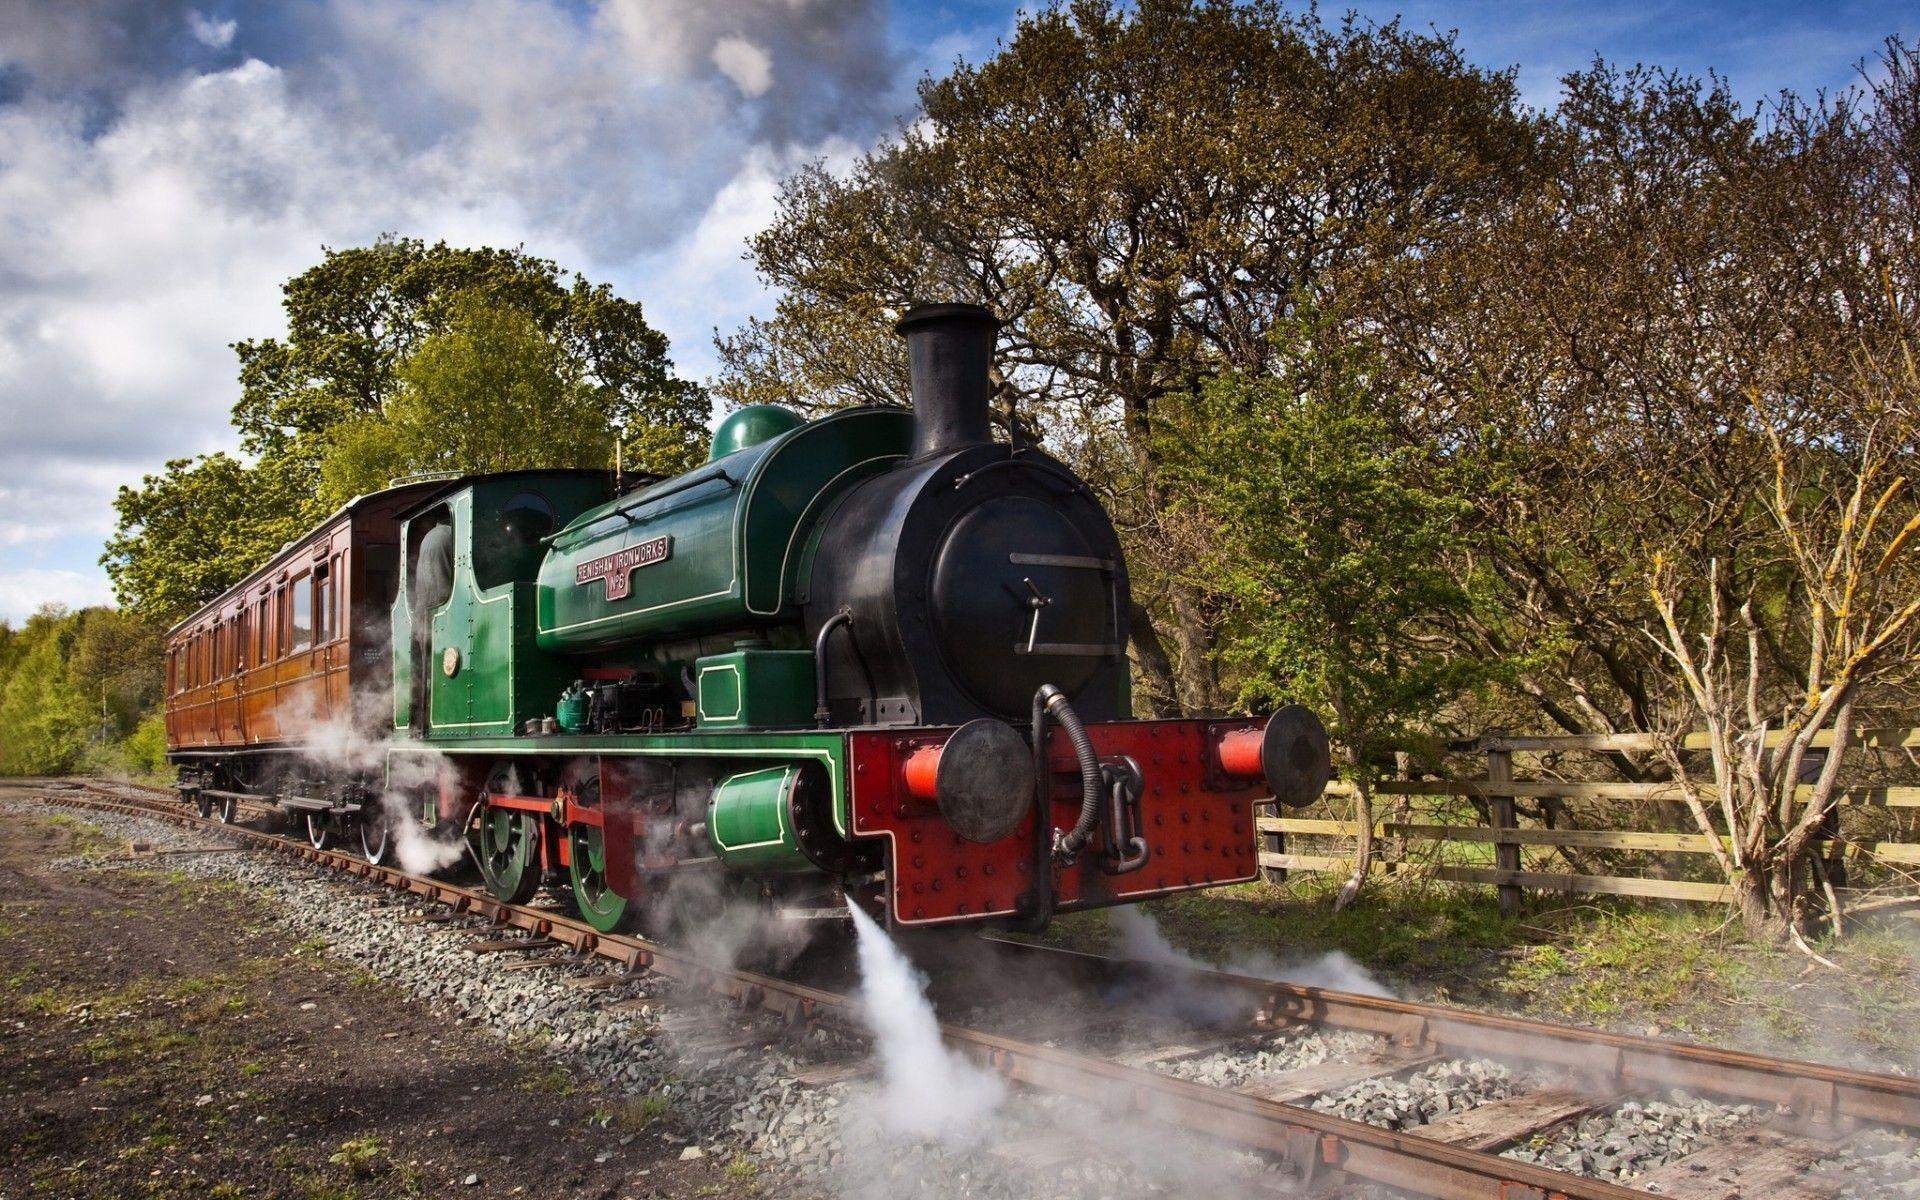 steam locomotive hd wallpapers - photo #27